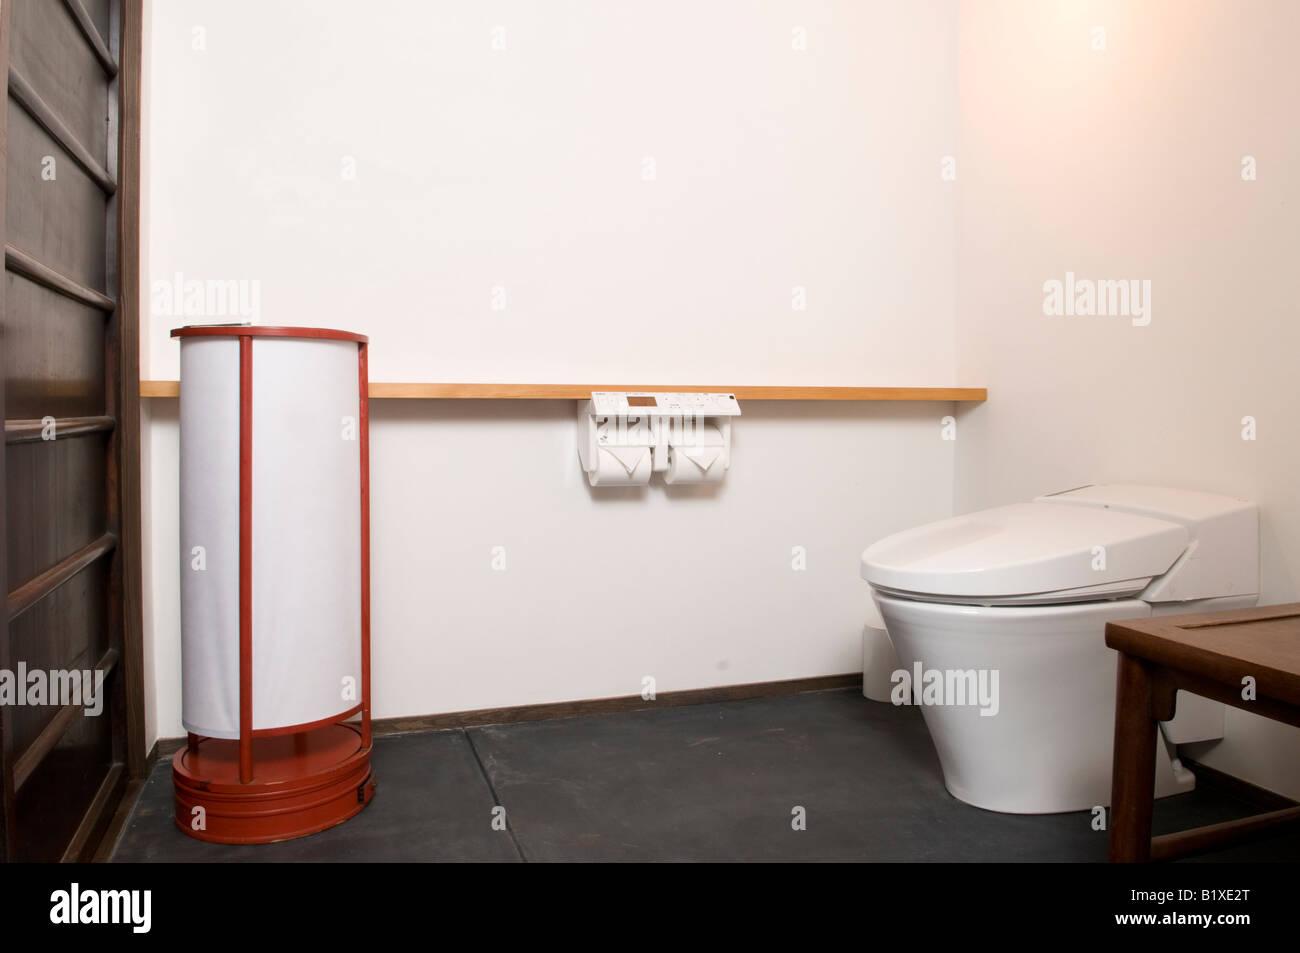 Japanese Toilets Stock Photos & Japanese Toilets Stock Images - Alamy